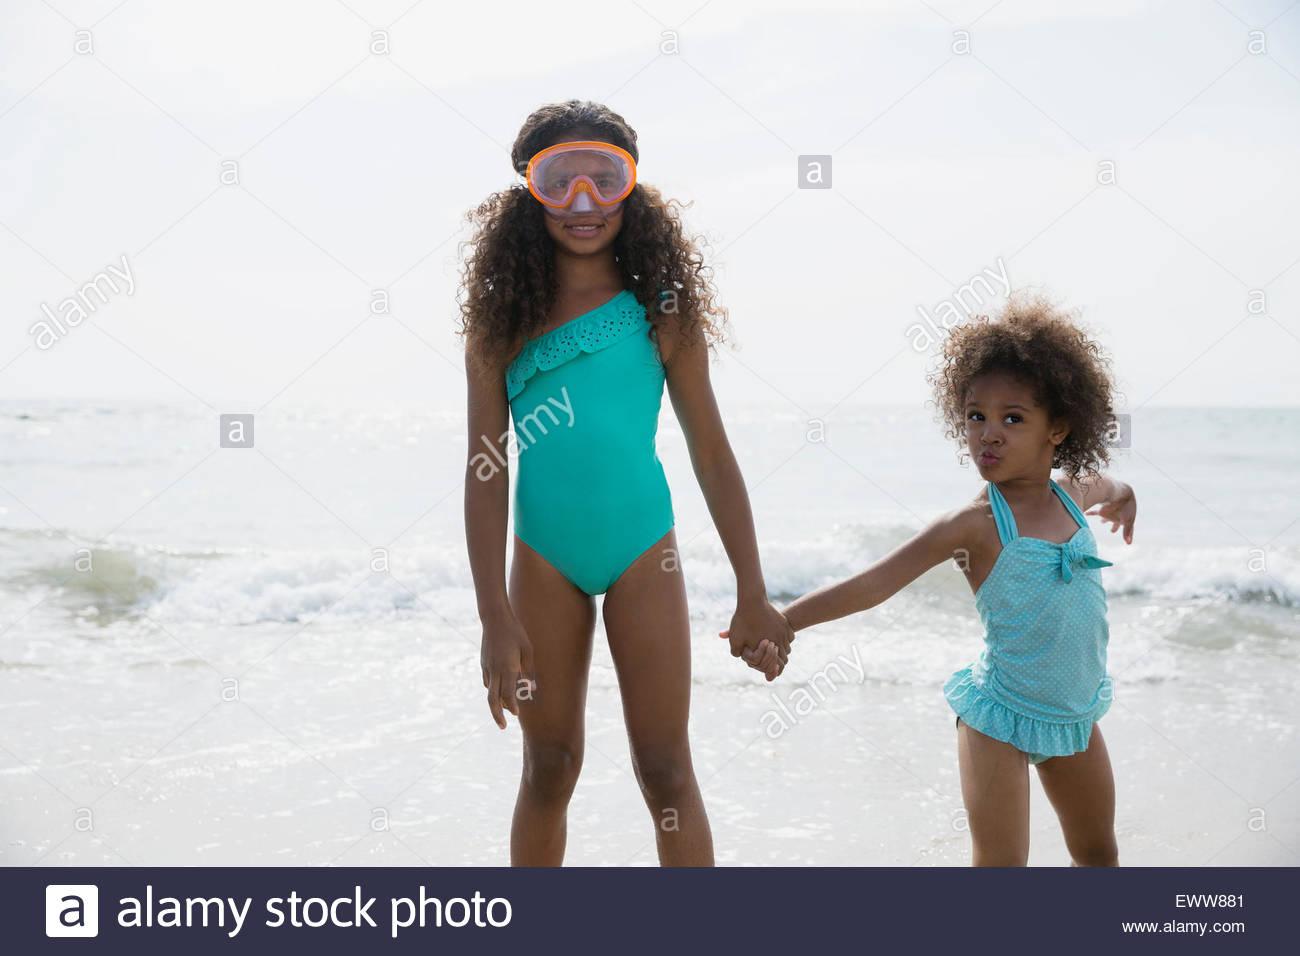 Portrait sisters in bathing suits wading in ocean - Stock Image